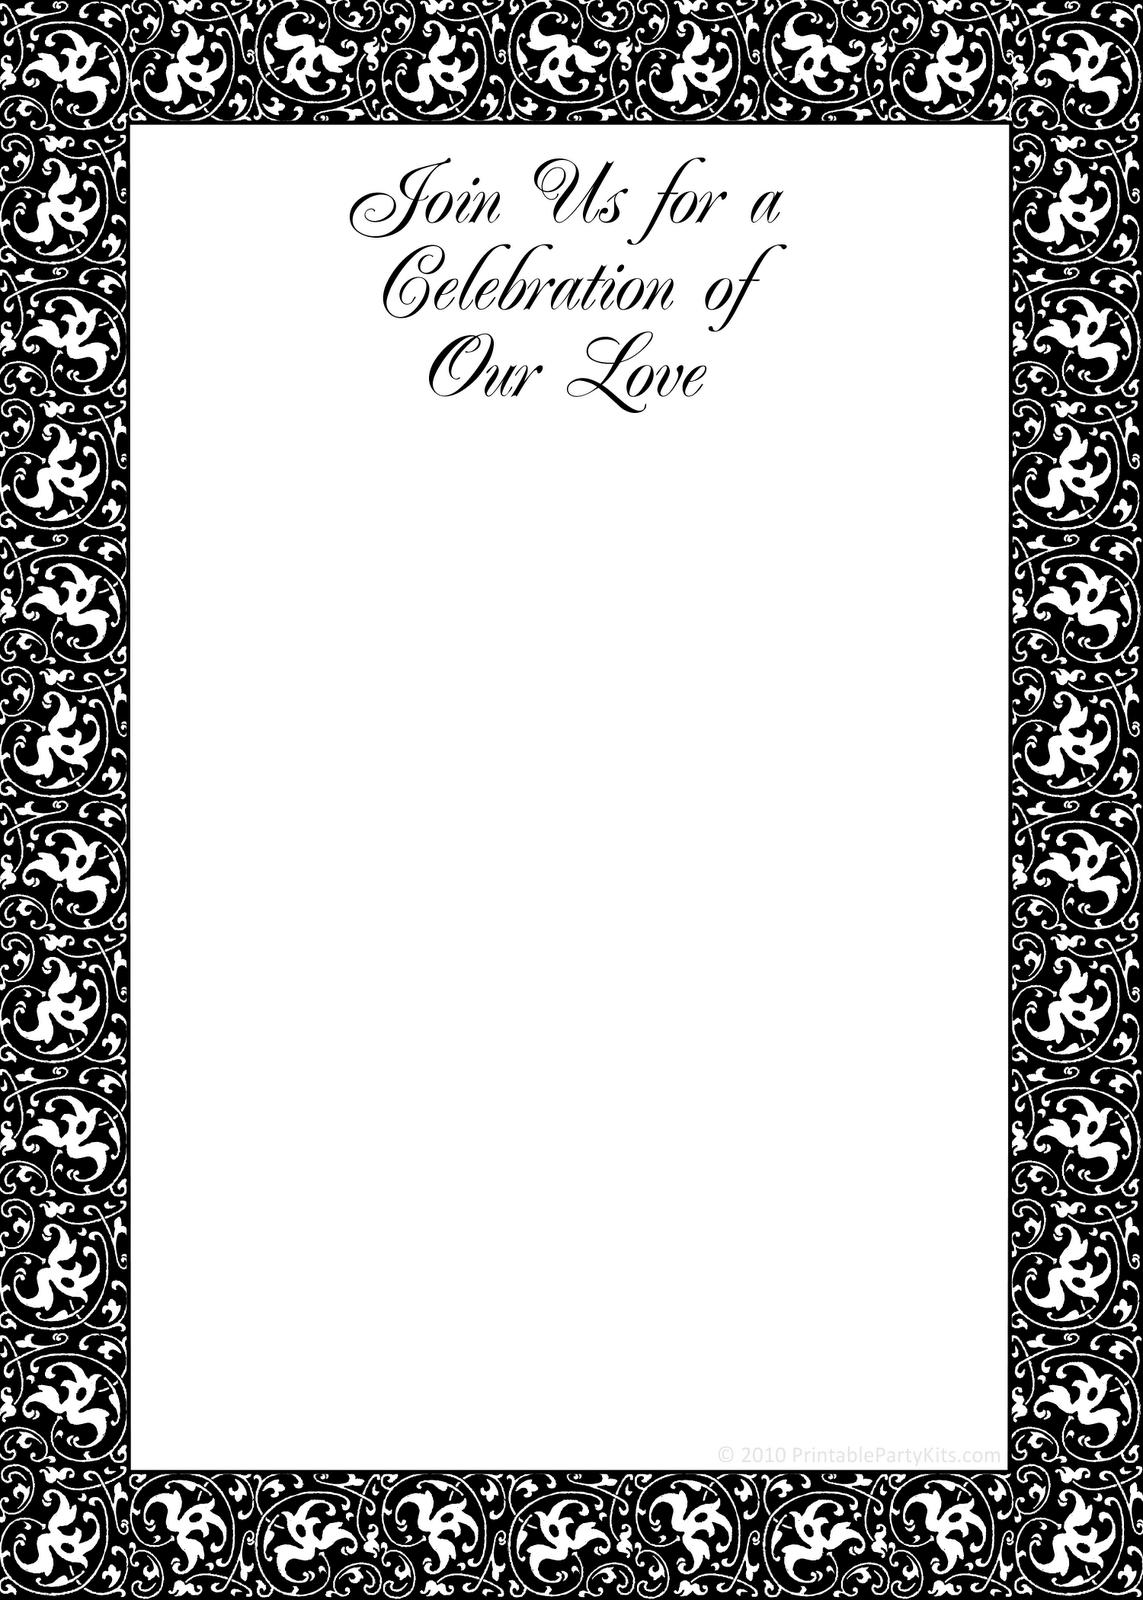 Templates Graduation Party Invitations Templates 2017 Graduation